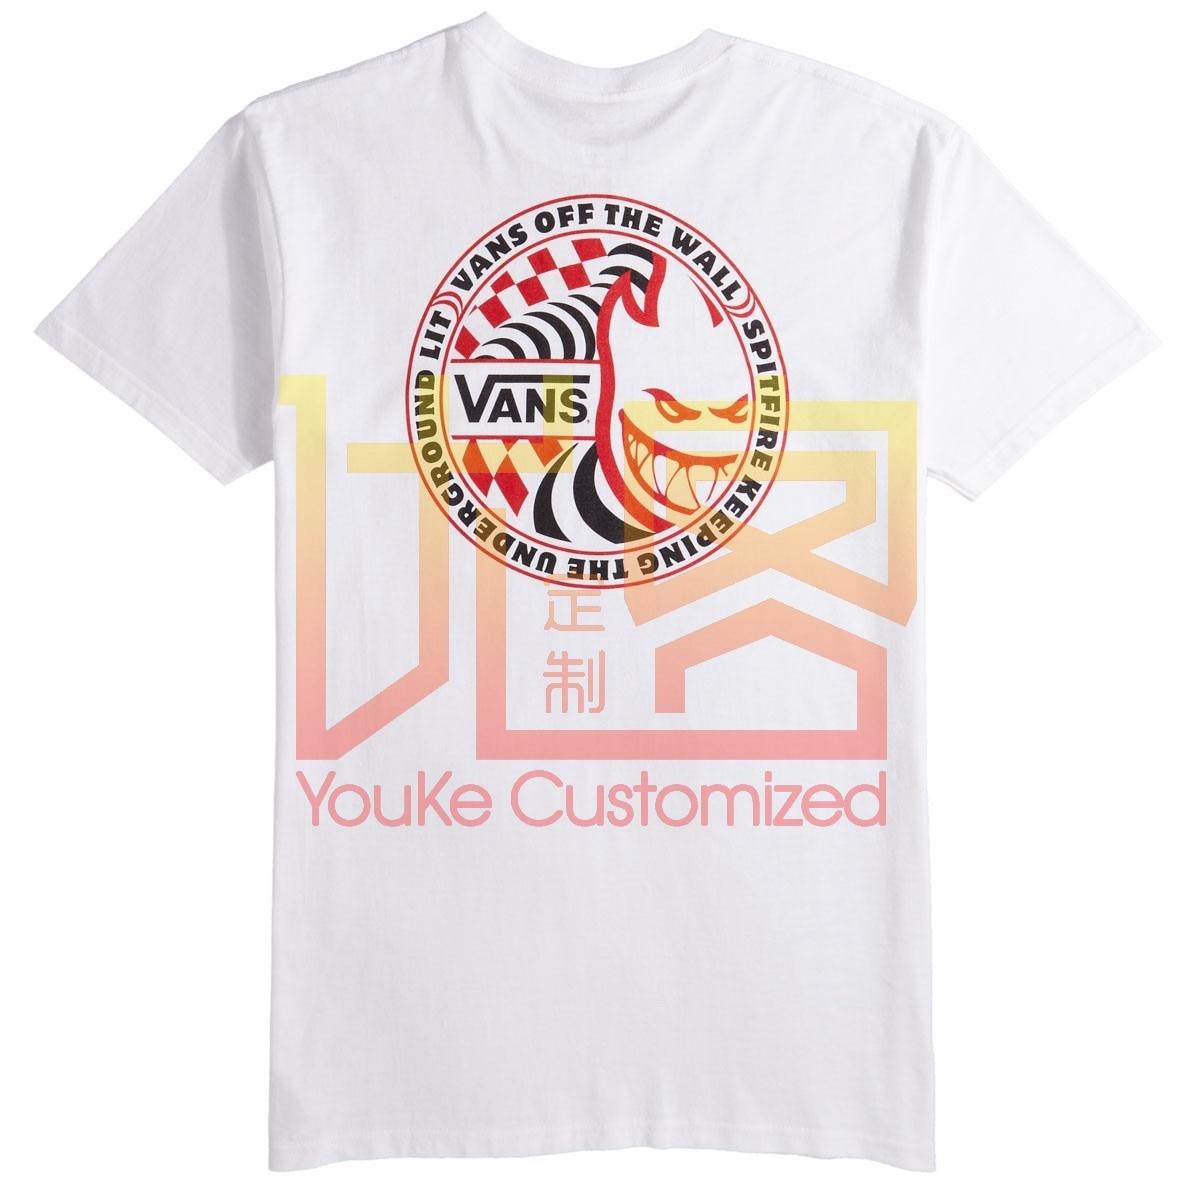 Vans X Spitfire T-Shirt Classic Style T-shirt Winner Tee Men Brand Clothing